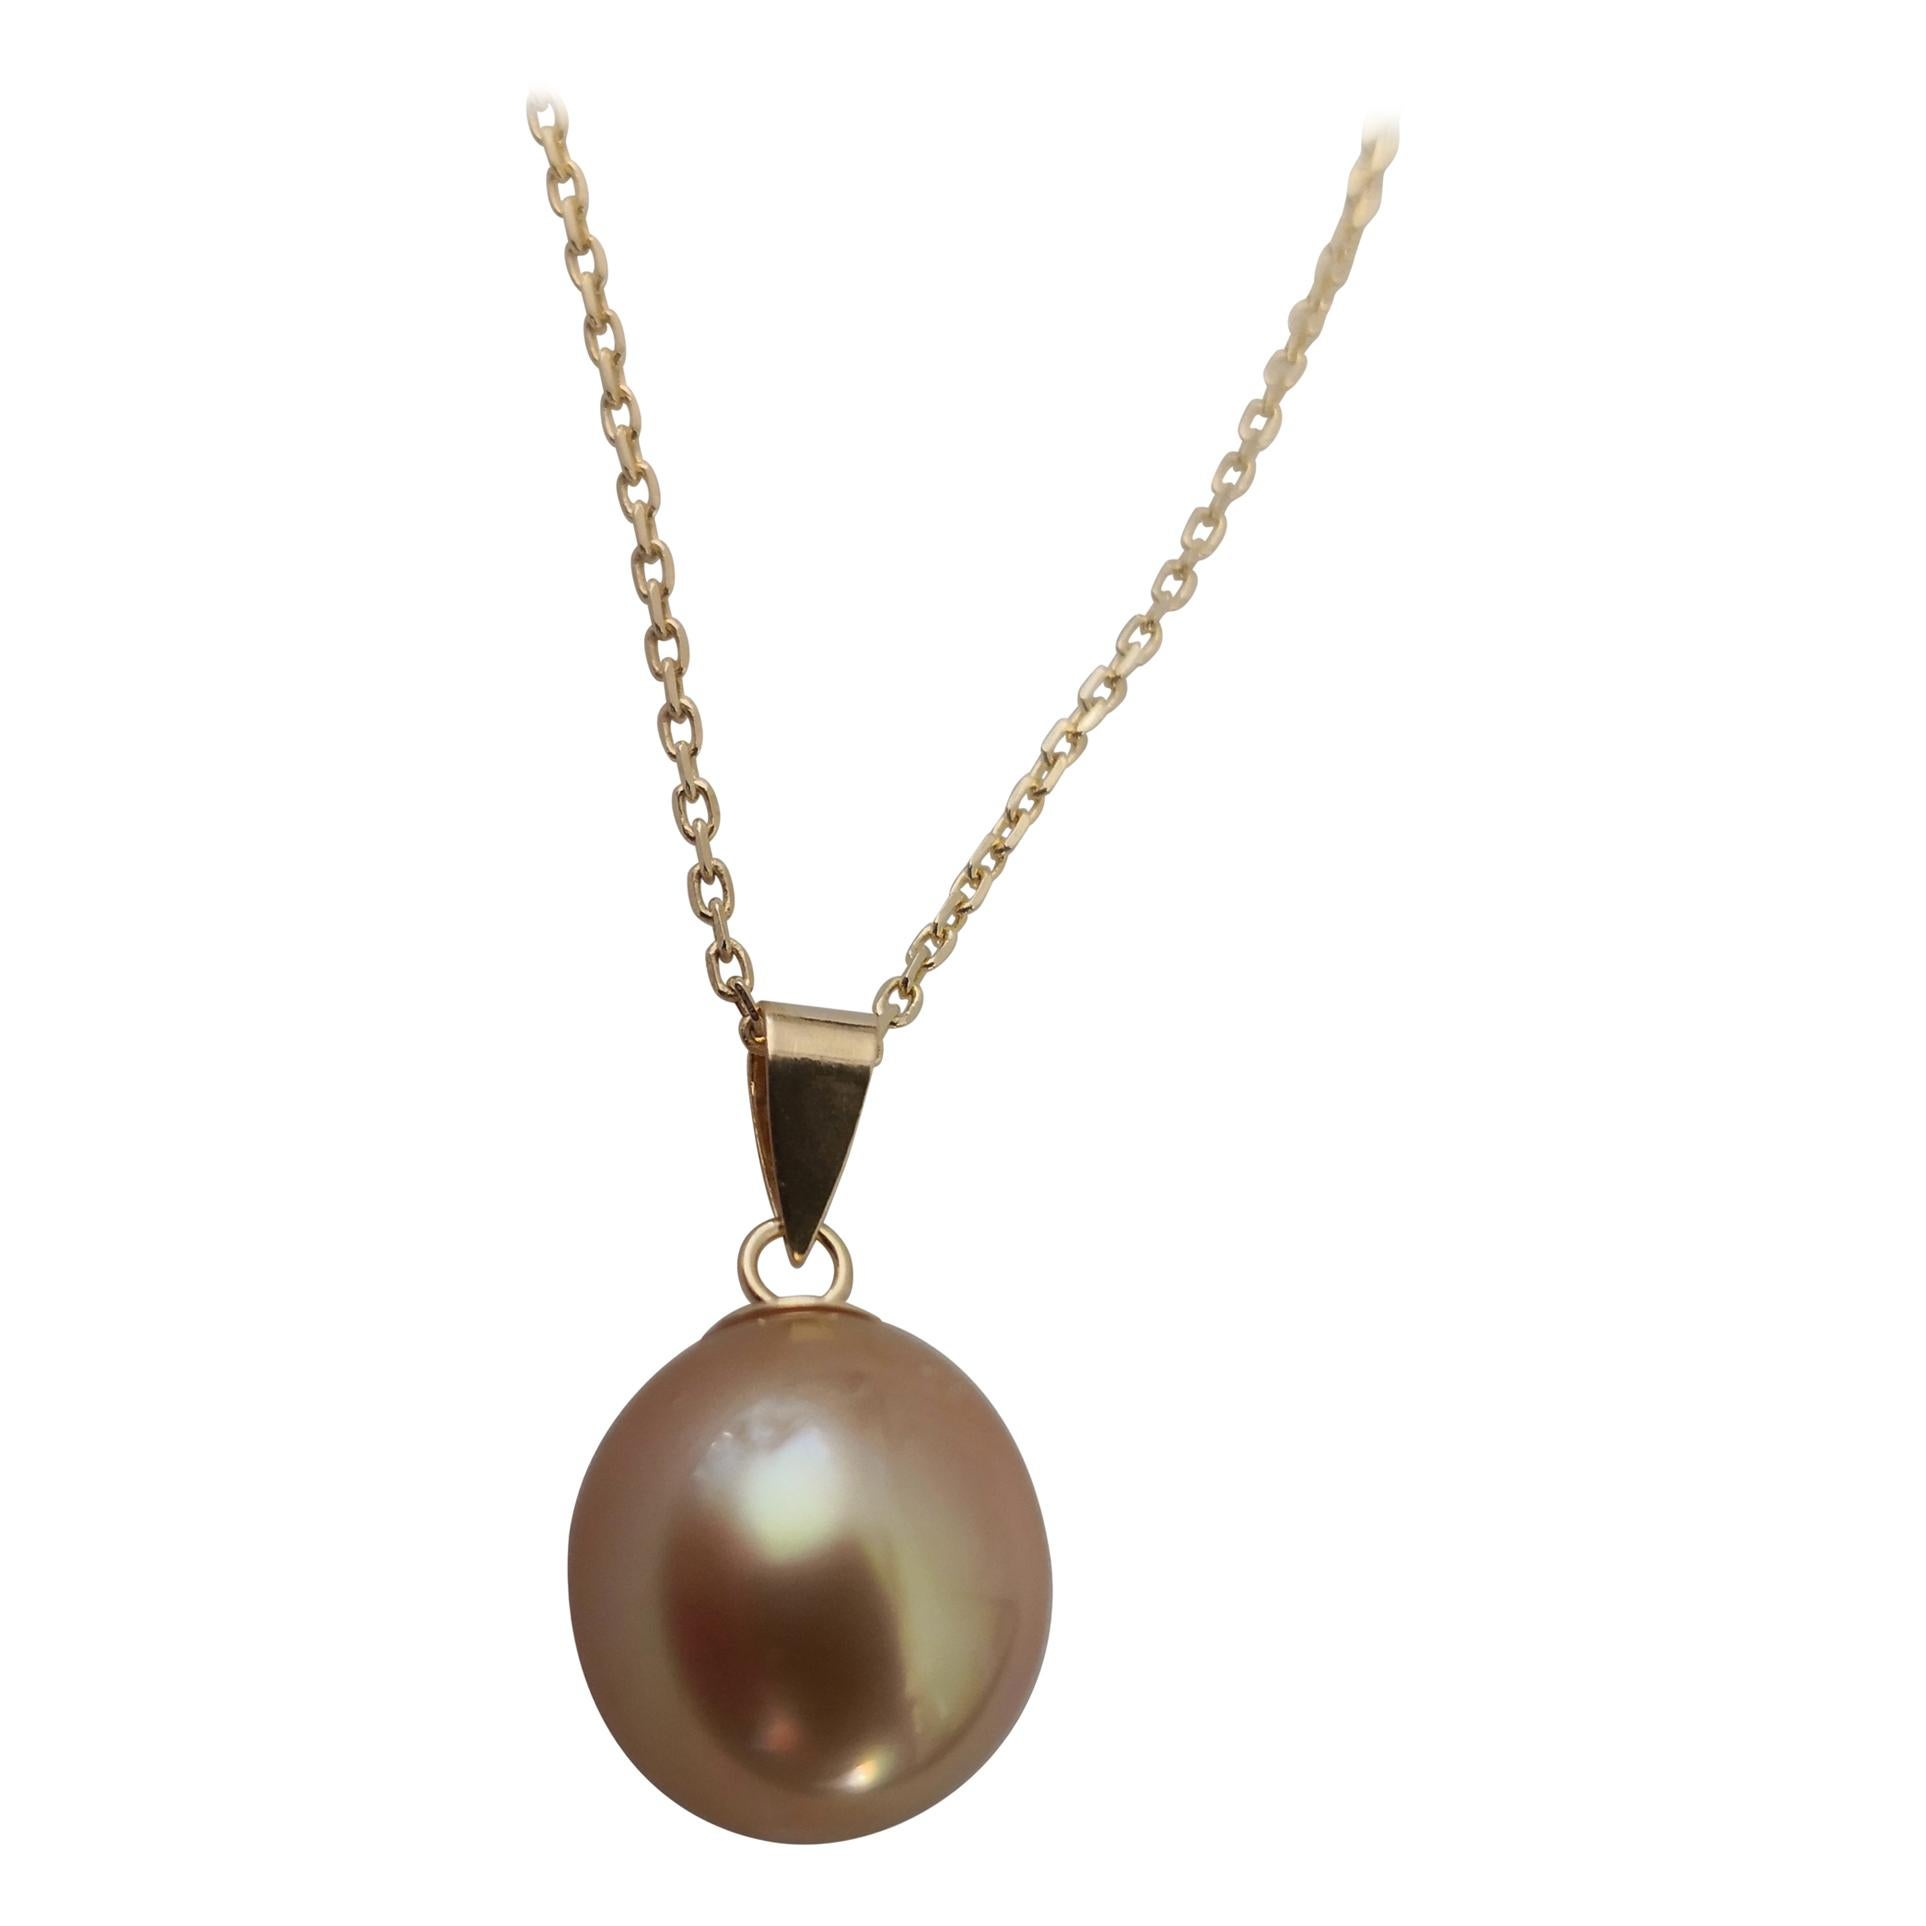 Golden South Sea Pearl Pendant 18 Karat Gold